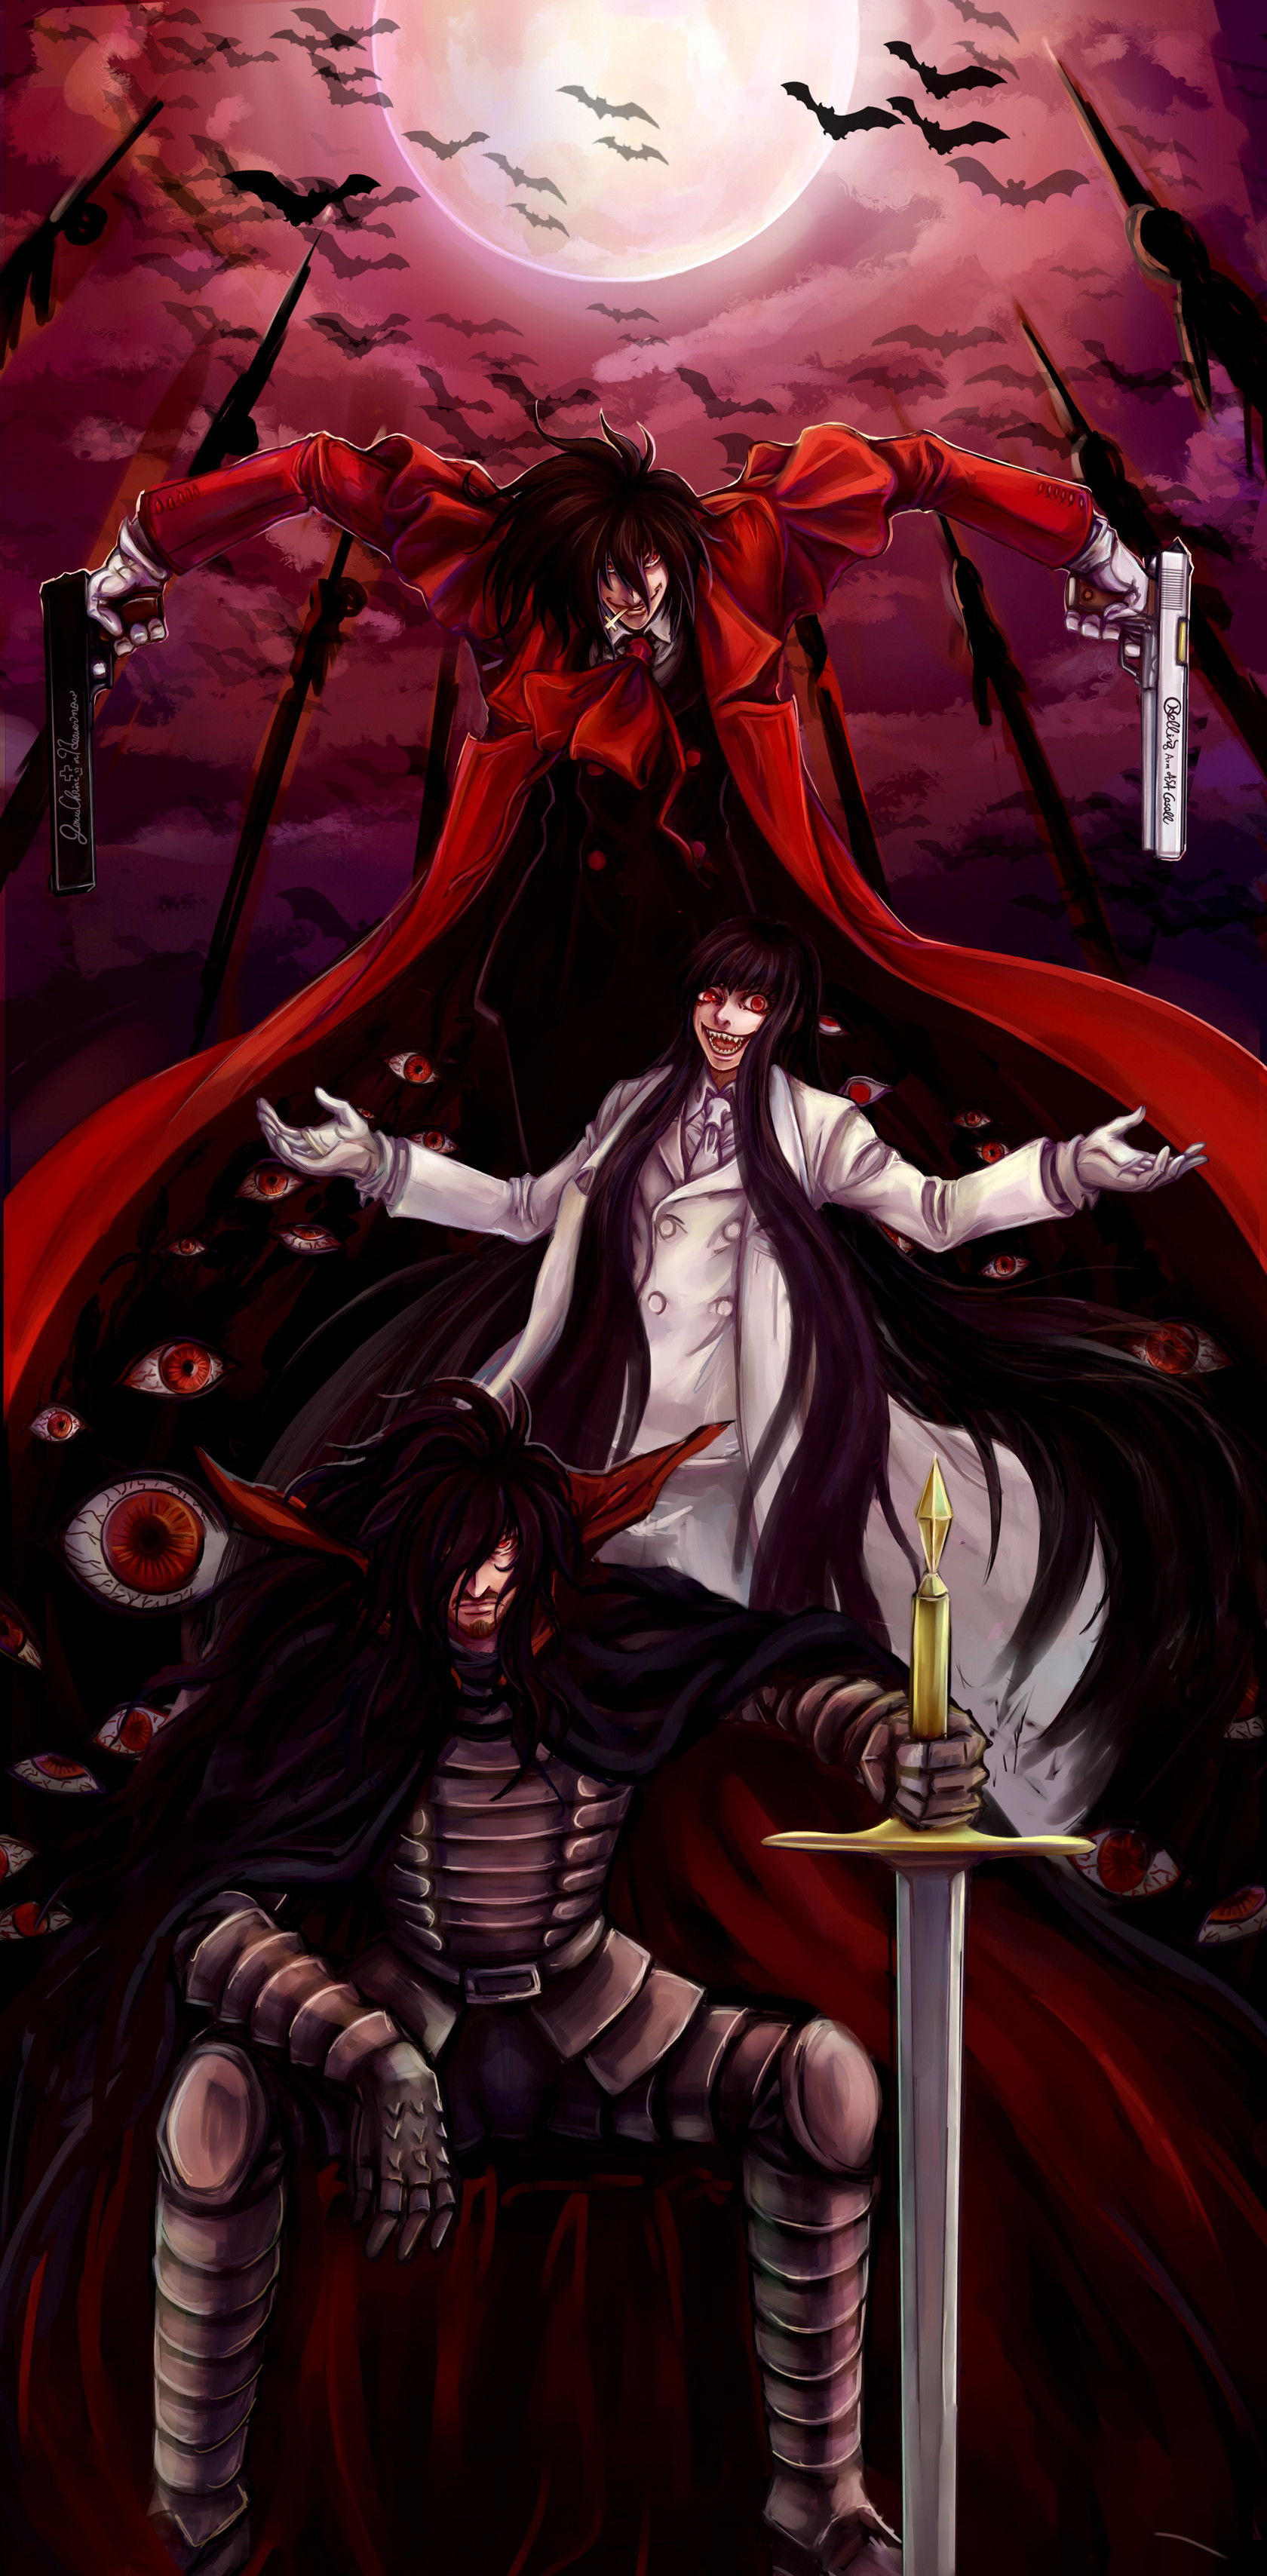 Alucard (Hellsing) · download Alucard (Hellsing) image